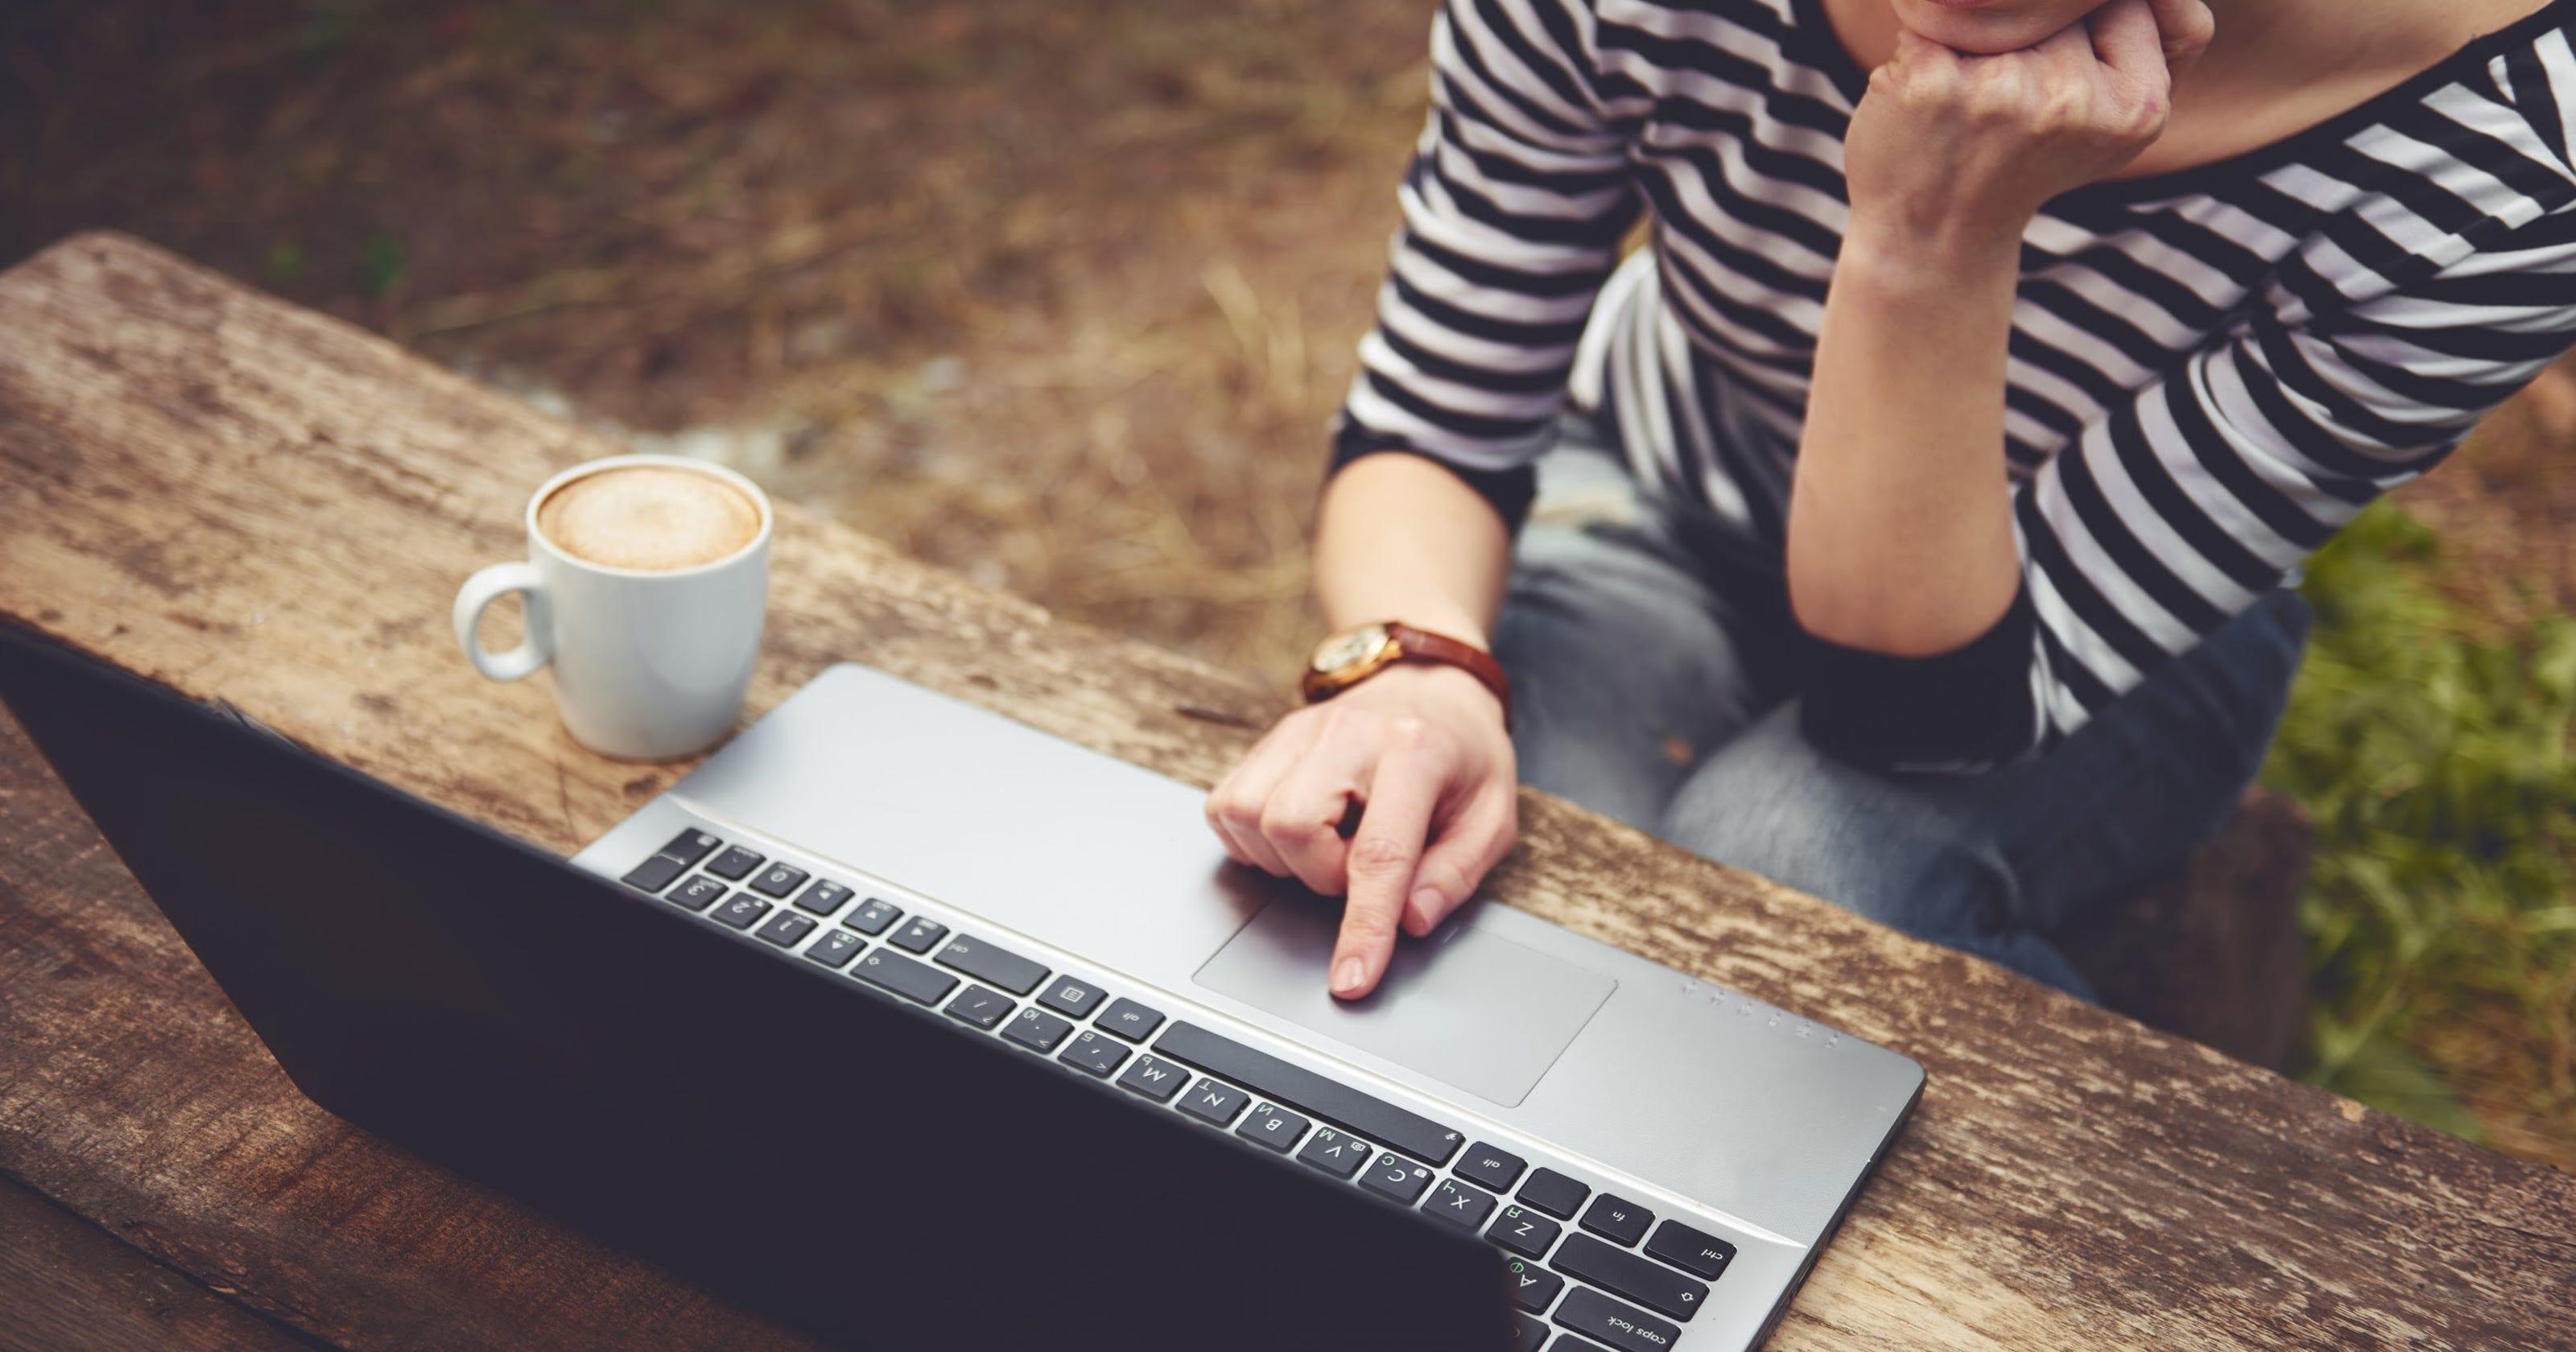 Seasonal Side Hustle Ideas For Making Money This Fall